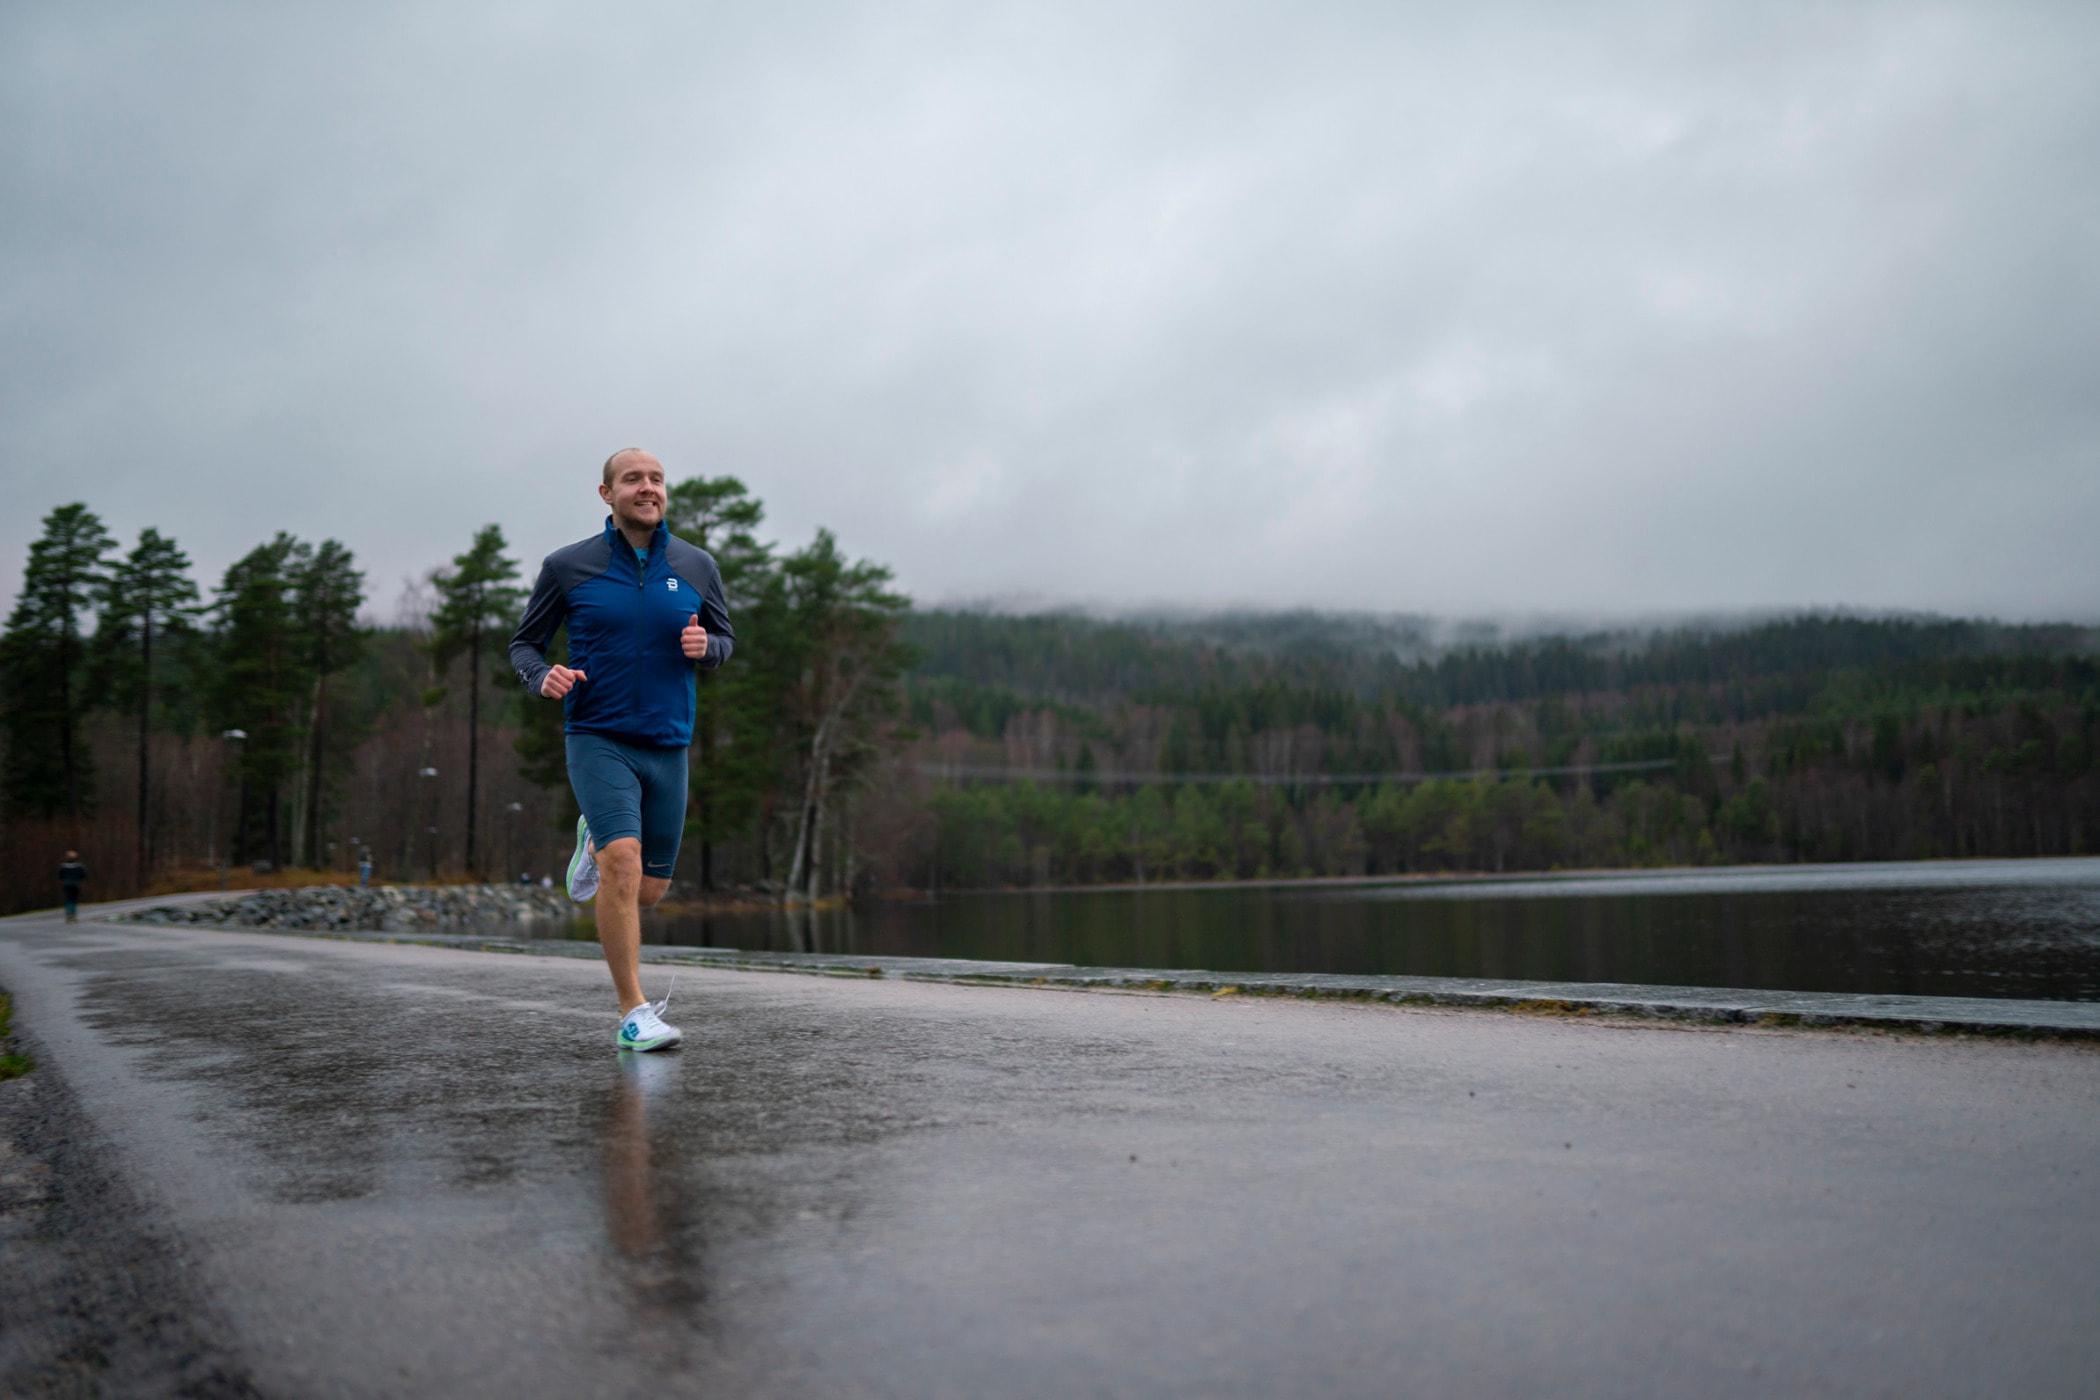 Individual sports, Long-distance running, Atmospheric phenomenon, Outdoor recreation, Water, Sky, Ultramarathon, Jogging